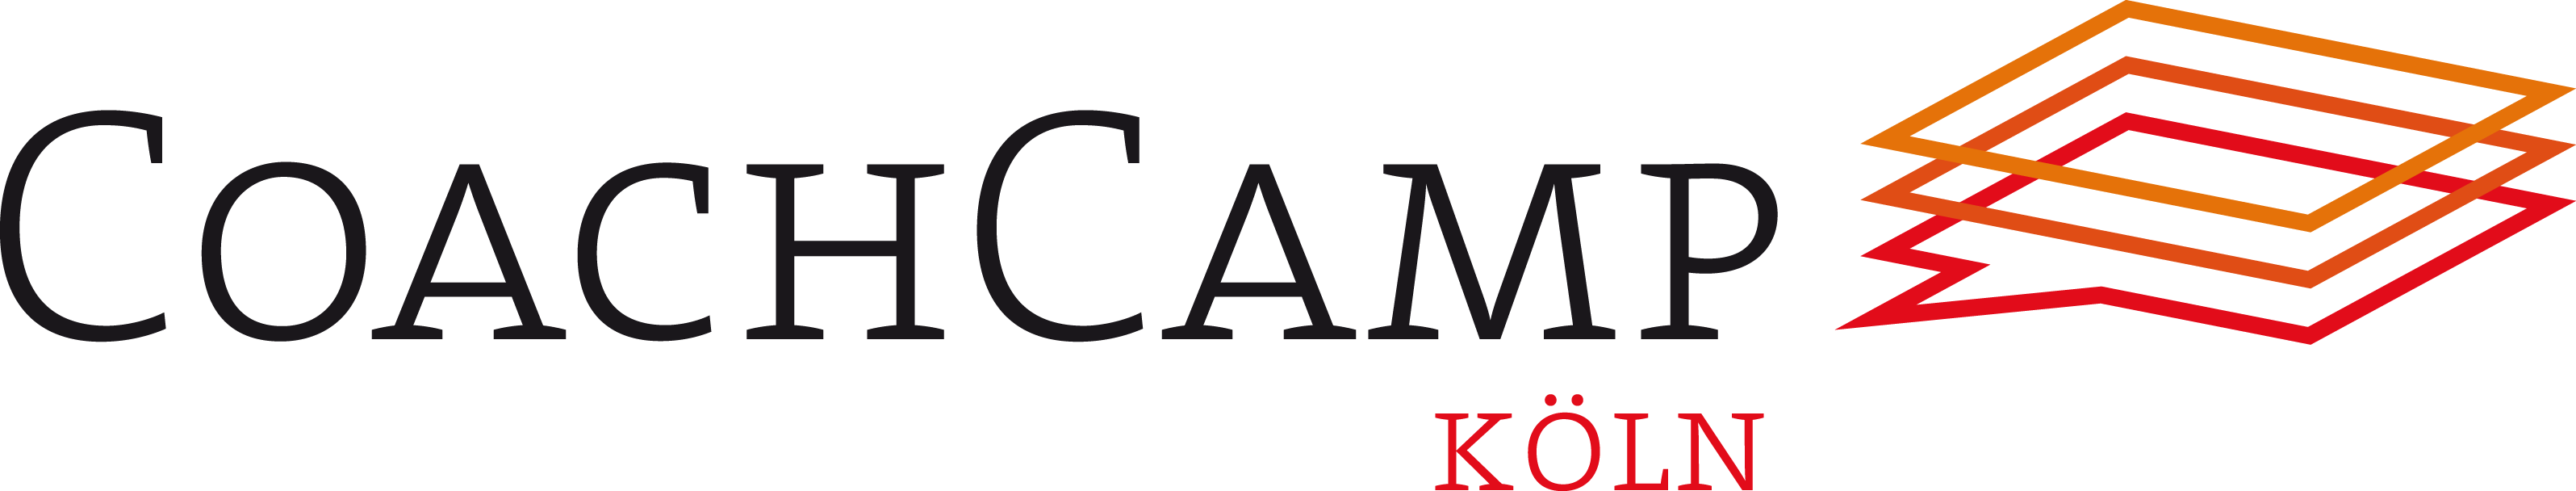 CoachCamp Köln 2019